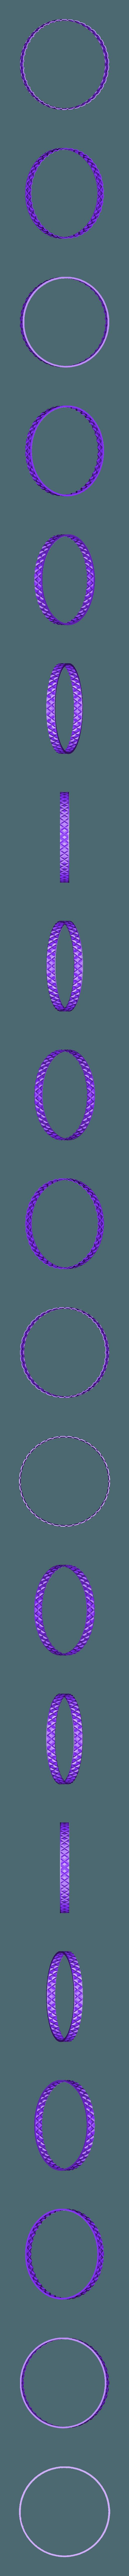 kv2_test_07.stl Download free SCAD file Knurled Pencils Pot • Template to 3D print, Wachet